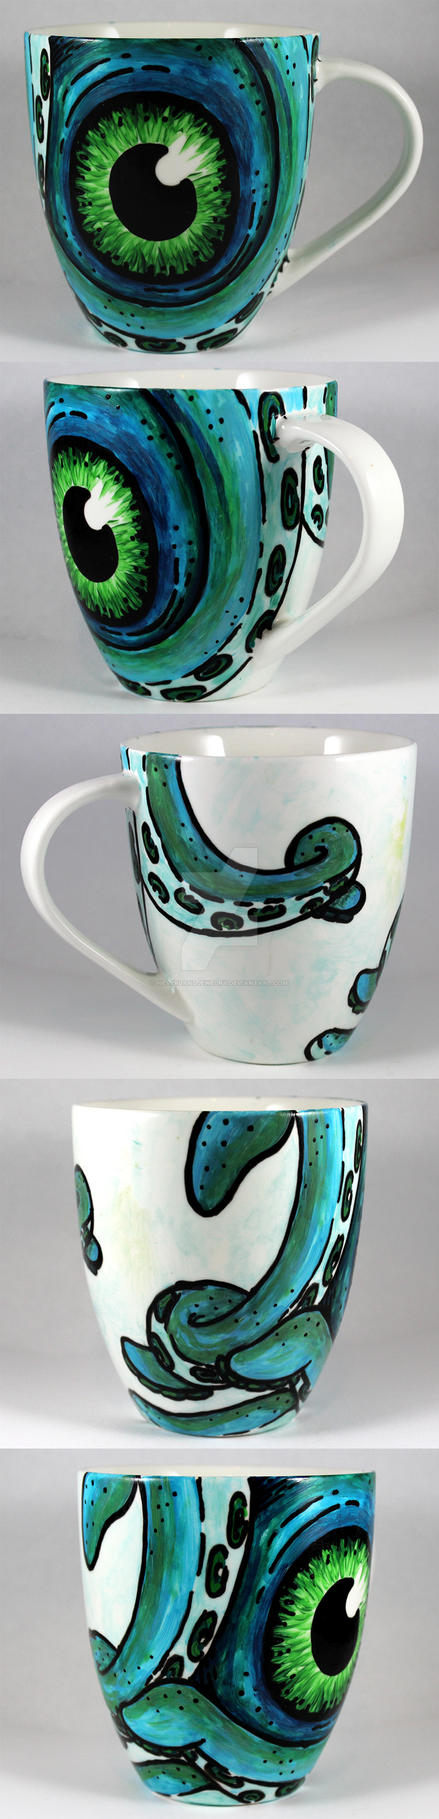 Handpainted Blue Octopus Cup by NeverlandJewelry